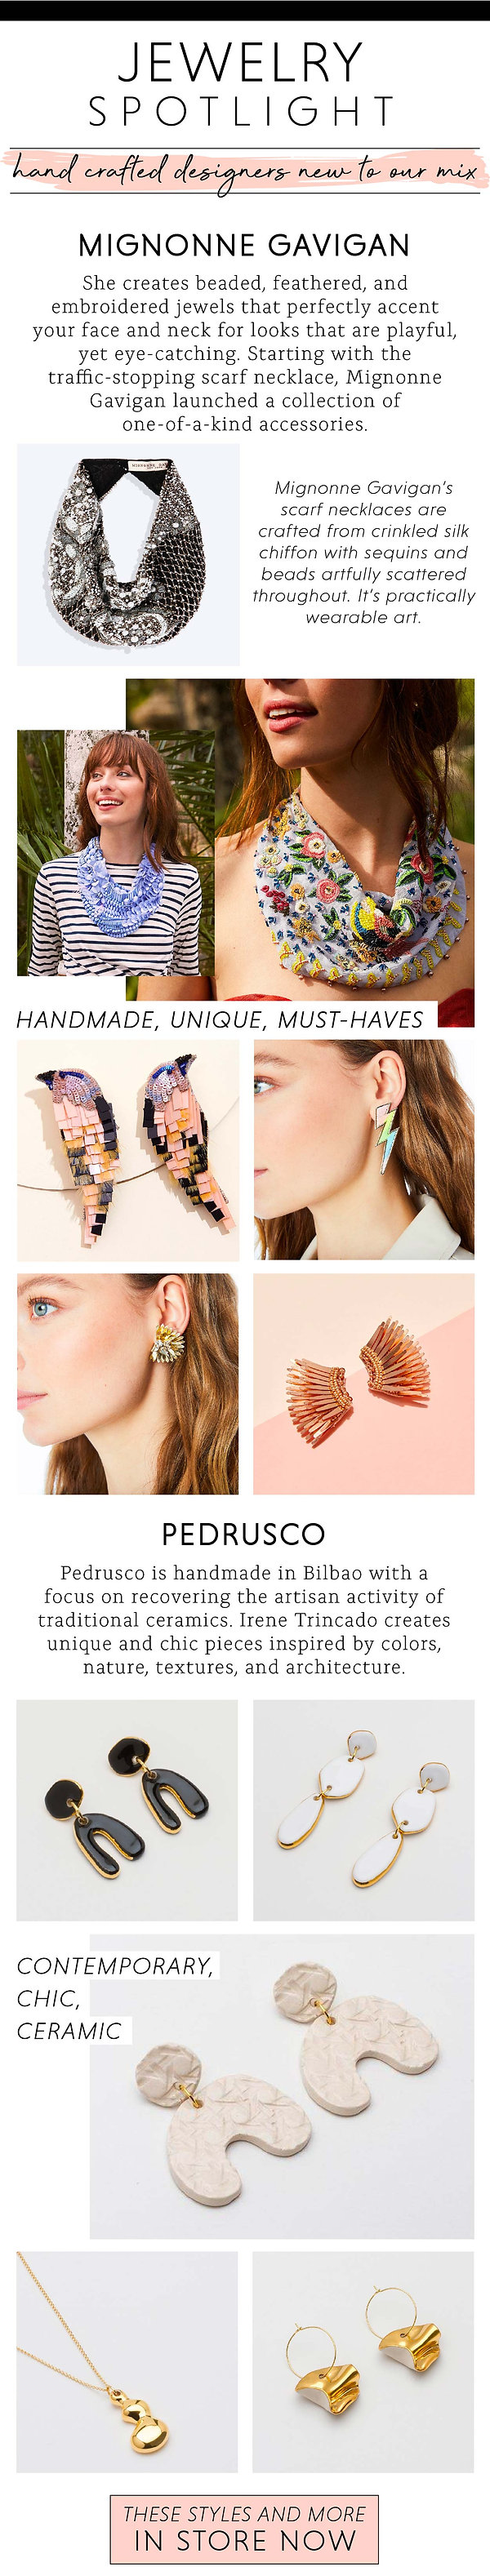 Summer Jewelry Spotlight.jpg